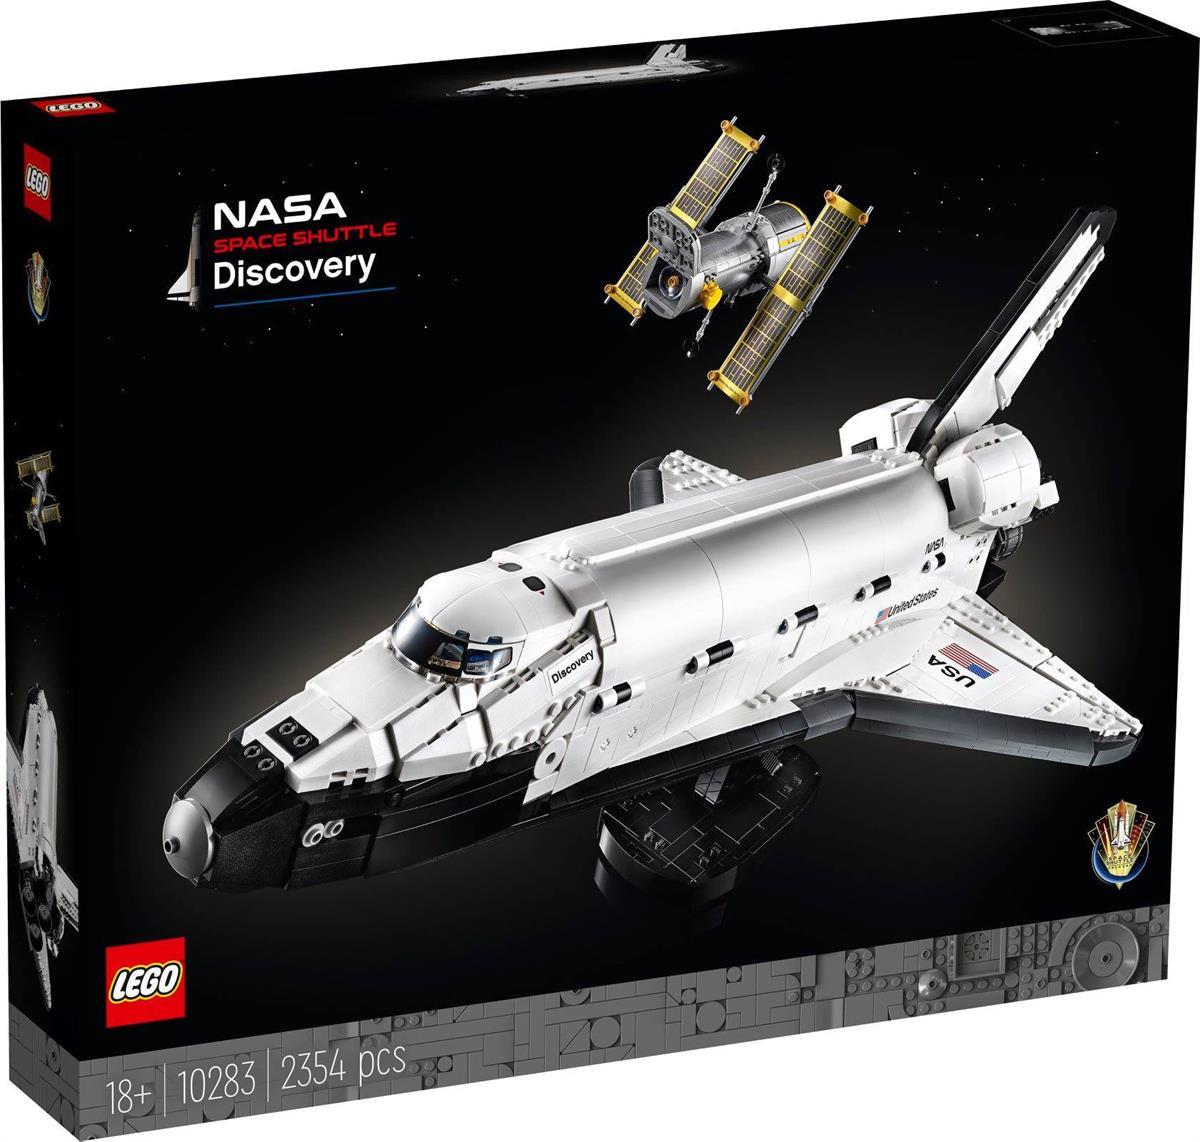 LEGO 10283 NASA SPACE SHUTTLE DISCOVERY CREATOR